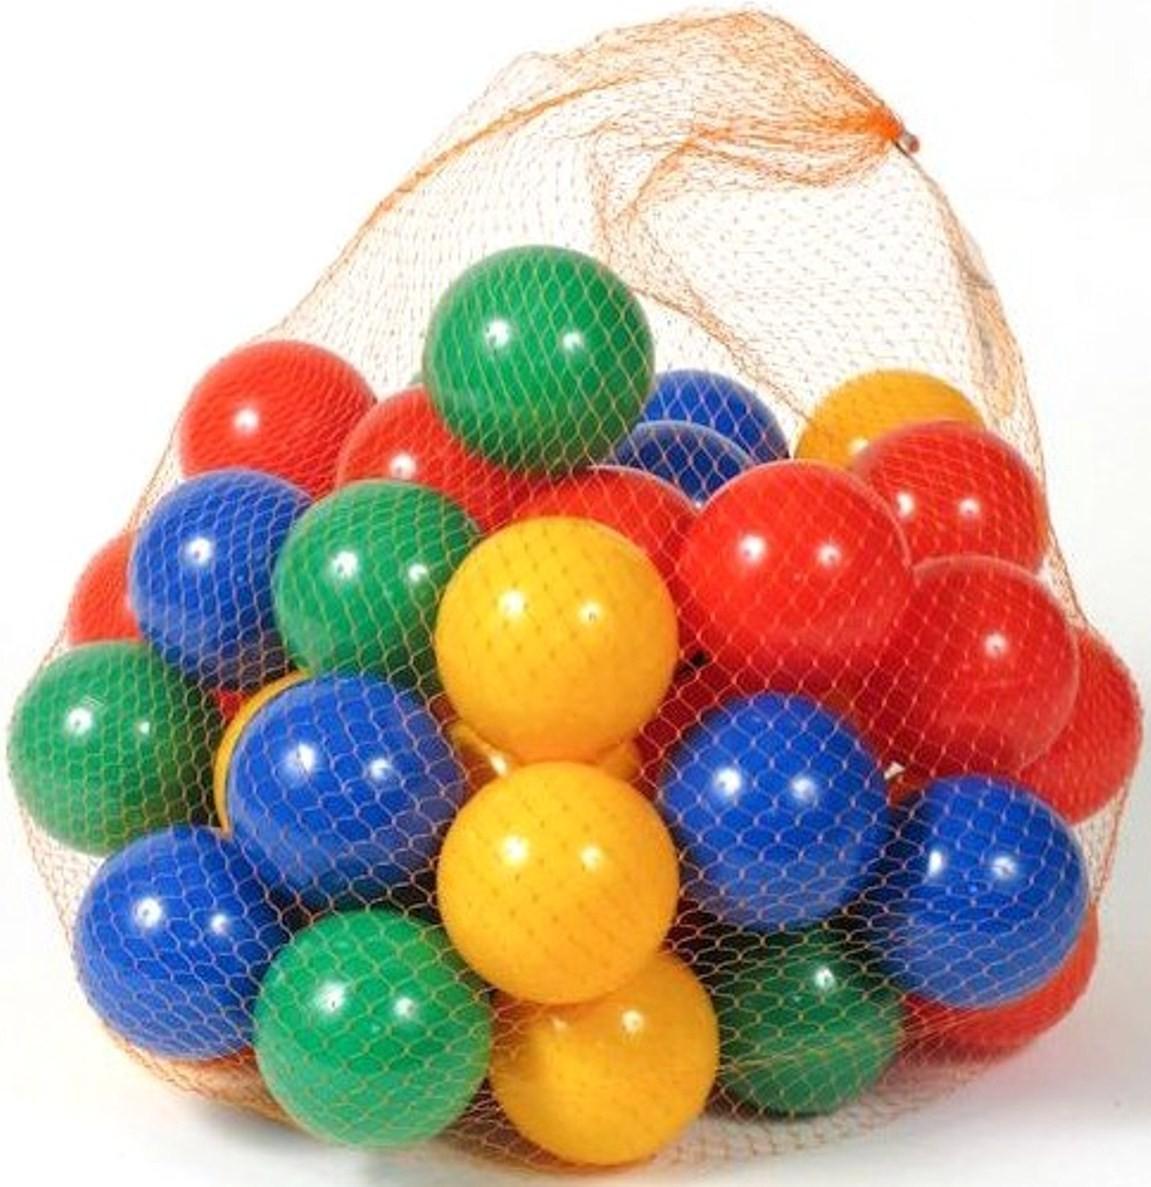 шарики и мячики картинки мере роста